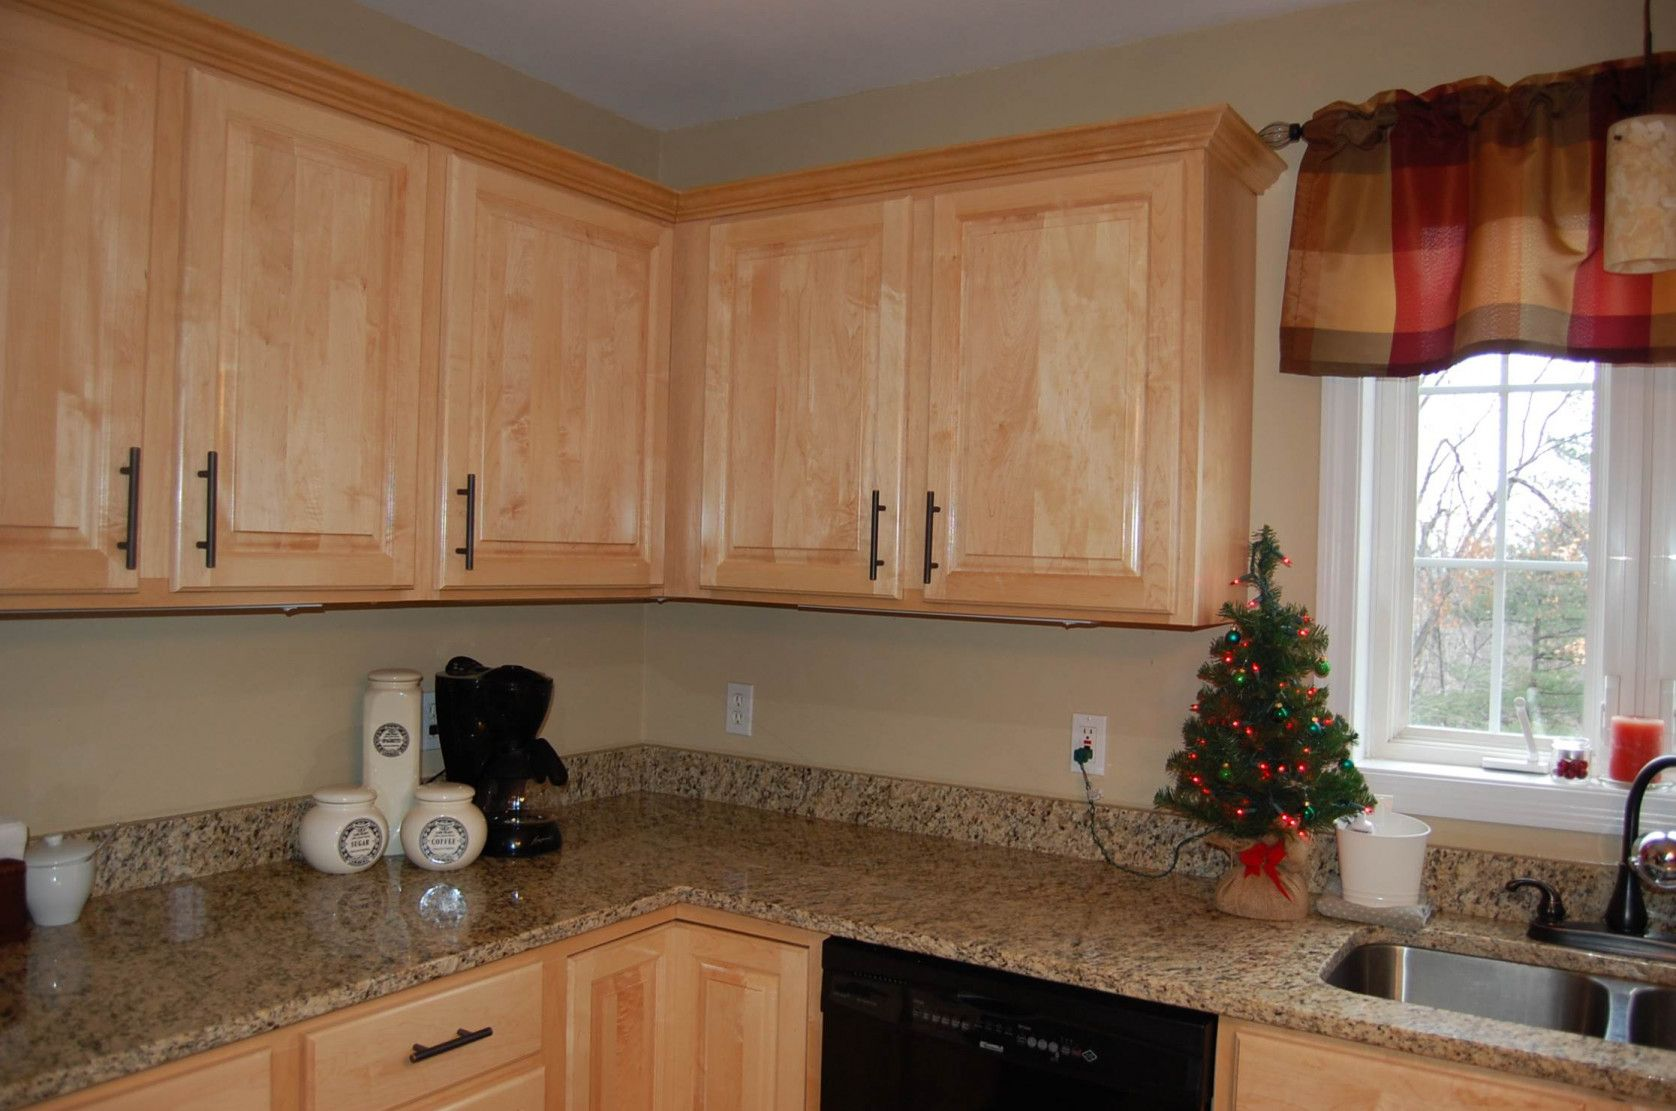 2019 Kitchen Cabinet Pulls With Backplates Kitchen Cabinets Storage Ideas Check M Kitchen Cabinet Makers Kitchen Cabinet Door Handles Rustic Kitchen Hardware